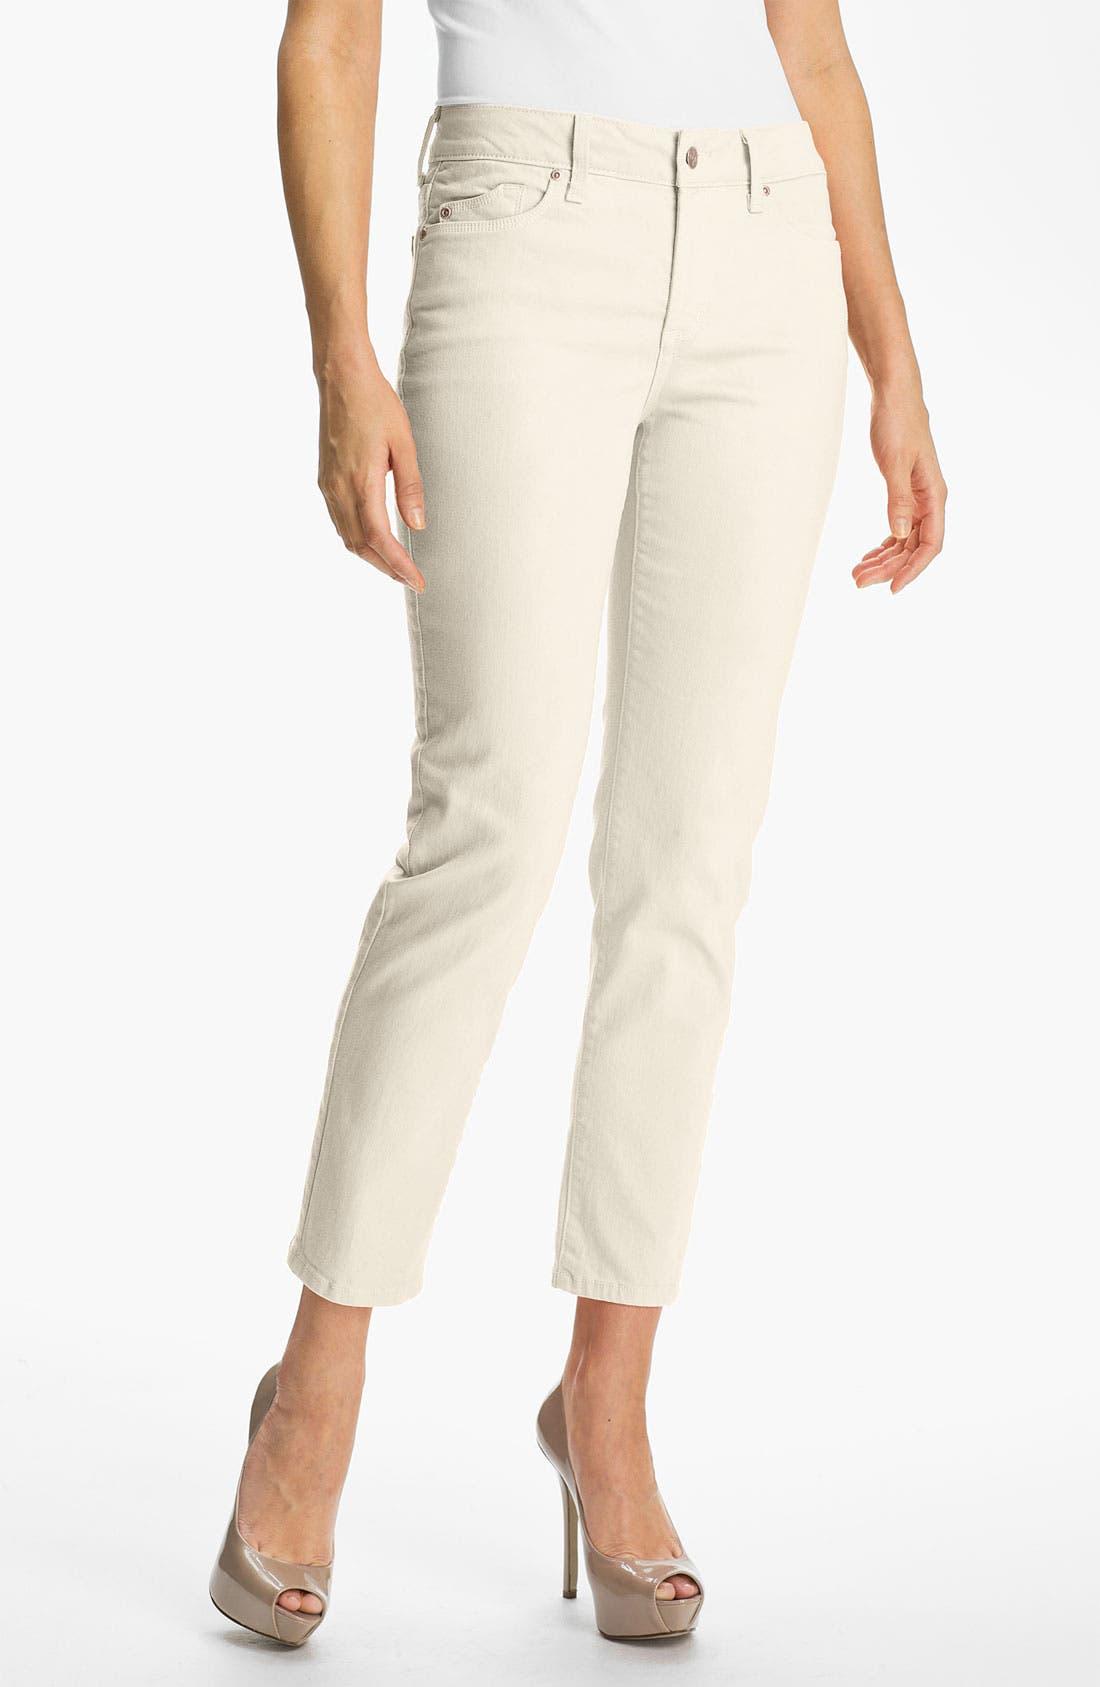 Alternate Image 1 Selected - NYDJ 'Alisha' Skinny Stretch Ankle Jeans (Regular & Petite)